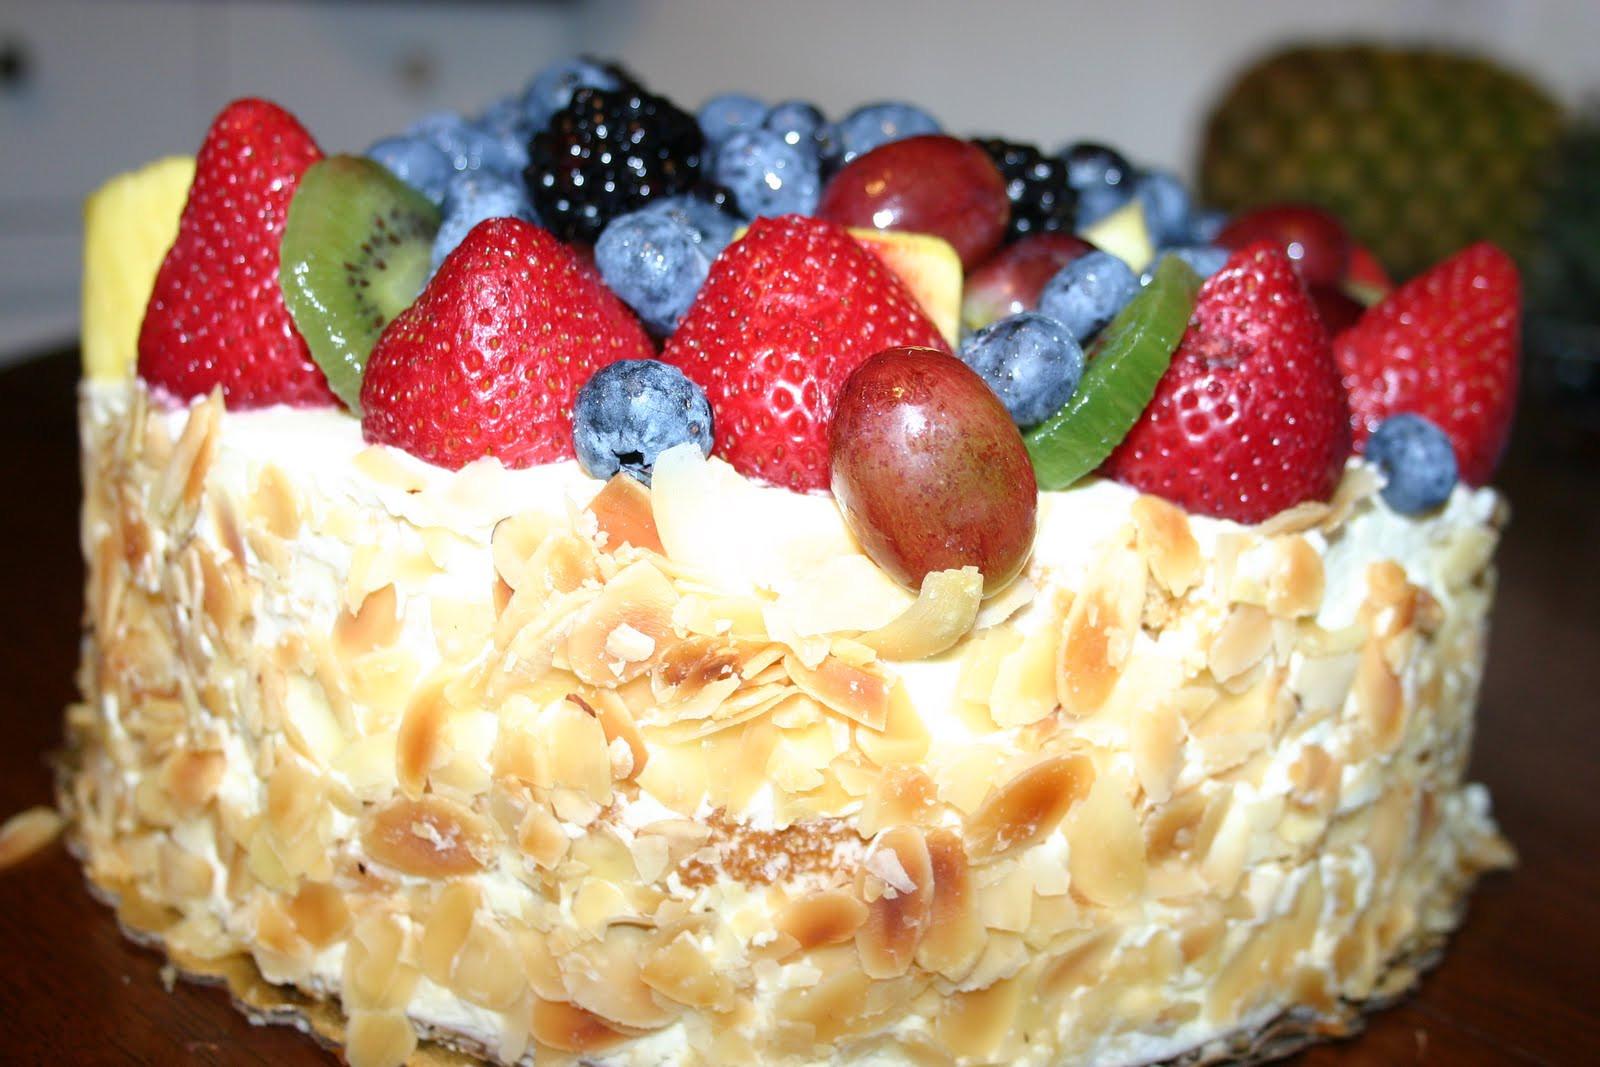 Whole Foods Wedding Cakes  A Million Things I Love 622 wedding birthday cake